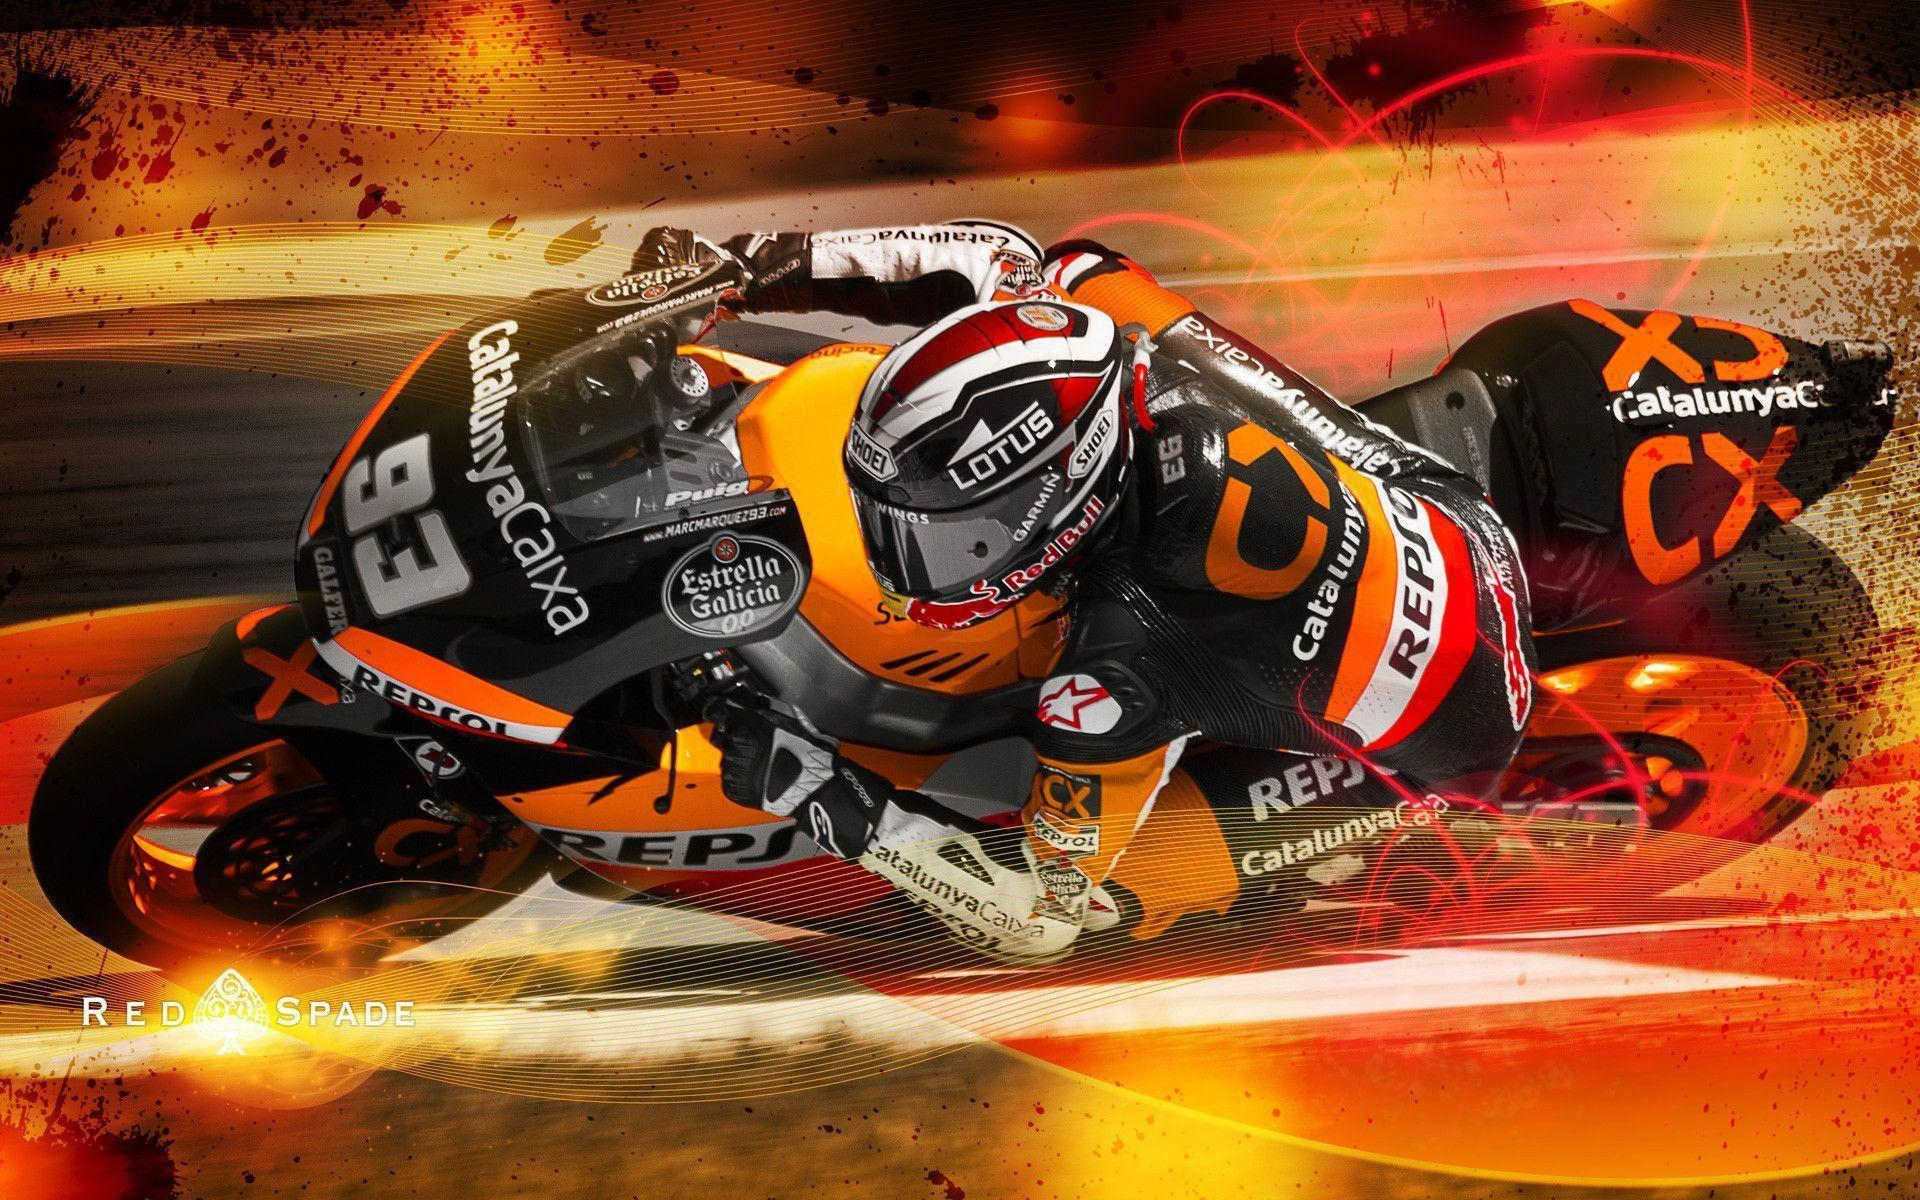 Moto GP Wallpapers 1920x1200